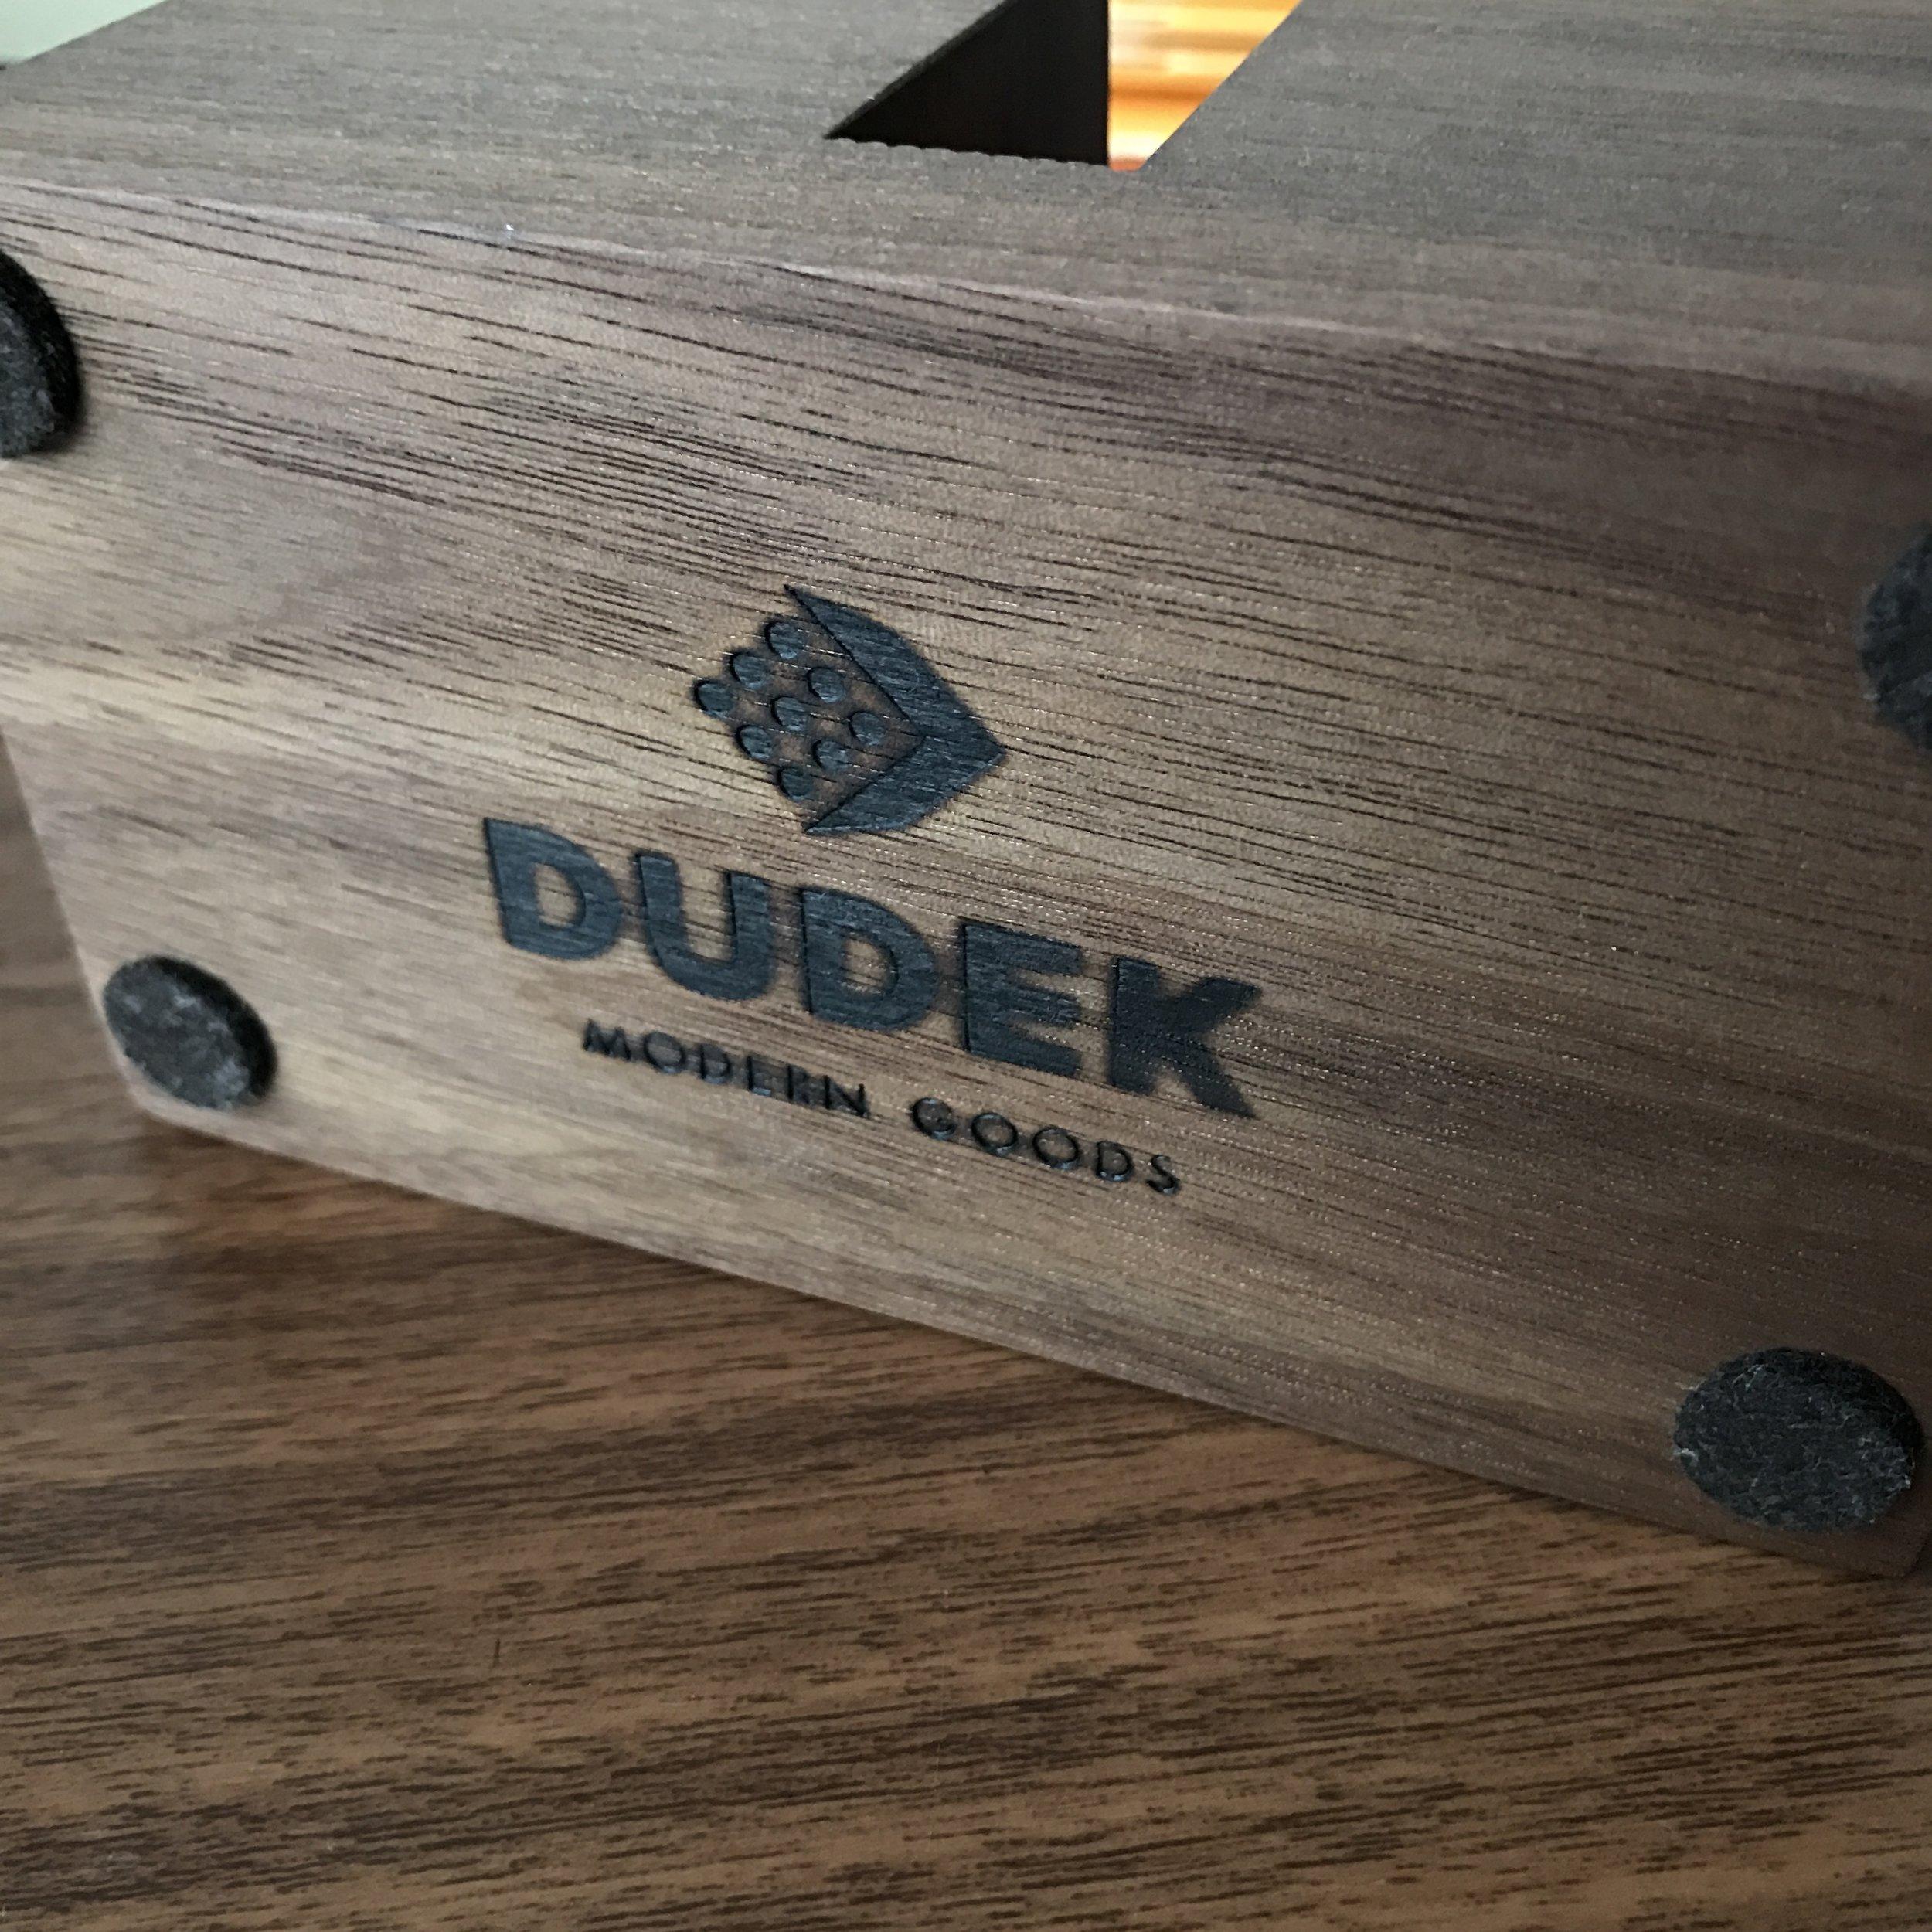 The Dudek Brand